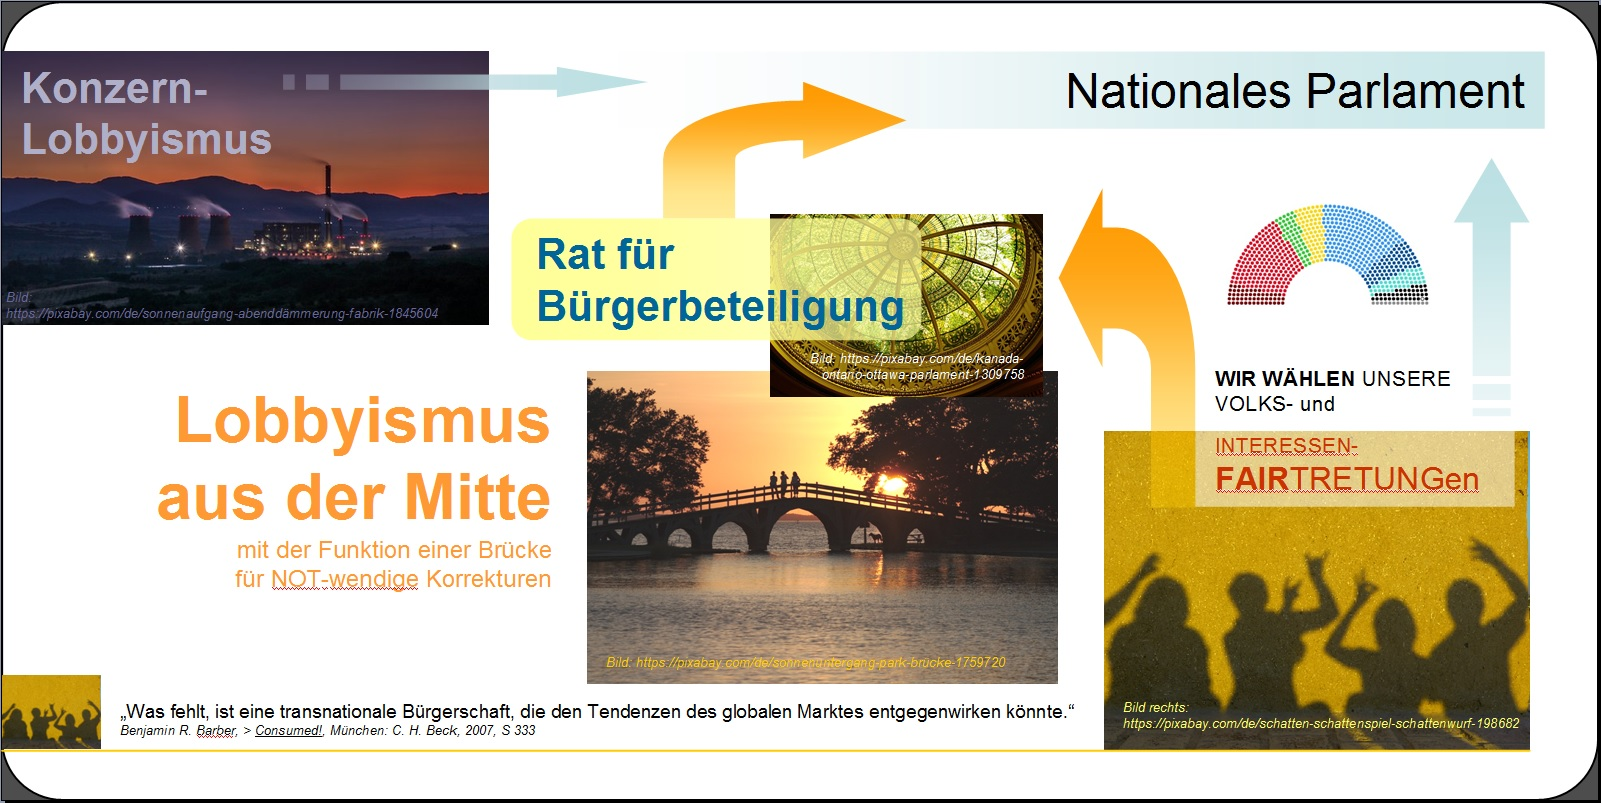 2017-01-26_konsent-kulturpreis_konzernlobbyismus-rat-fuer-buergerbeteiligung